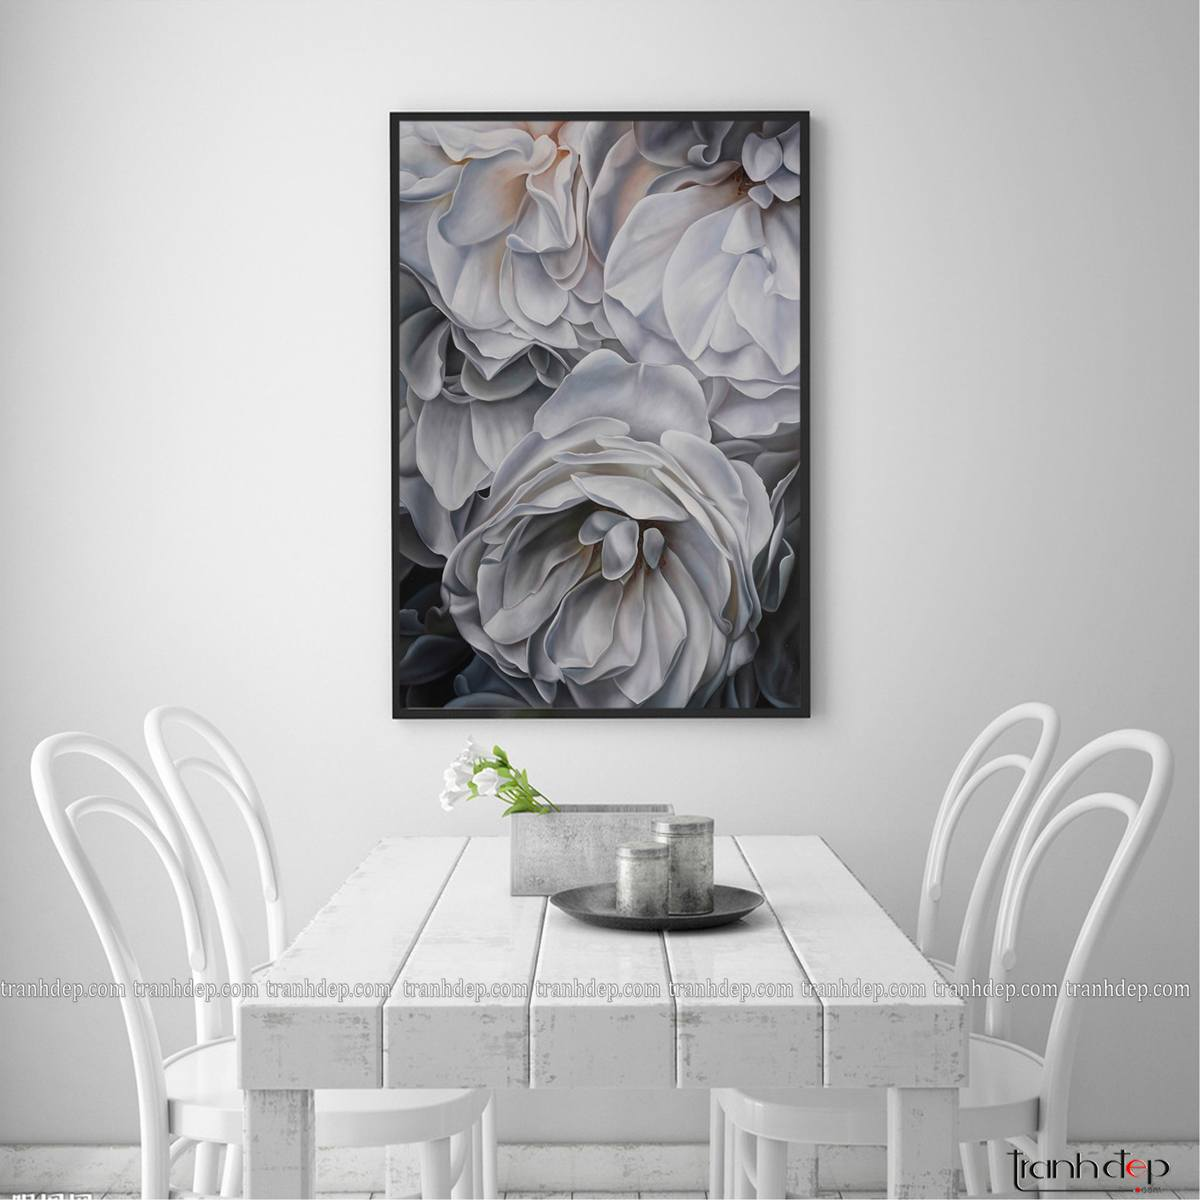 tranh hoa treo phòng ăn